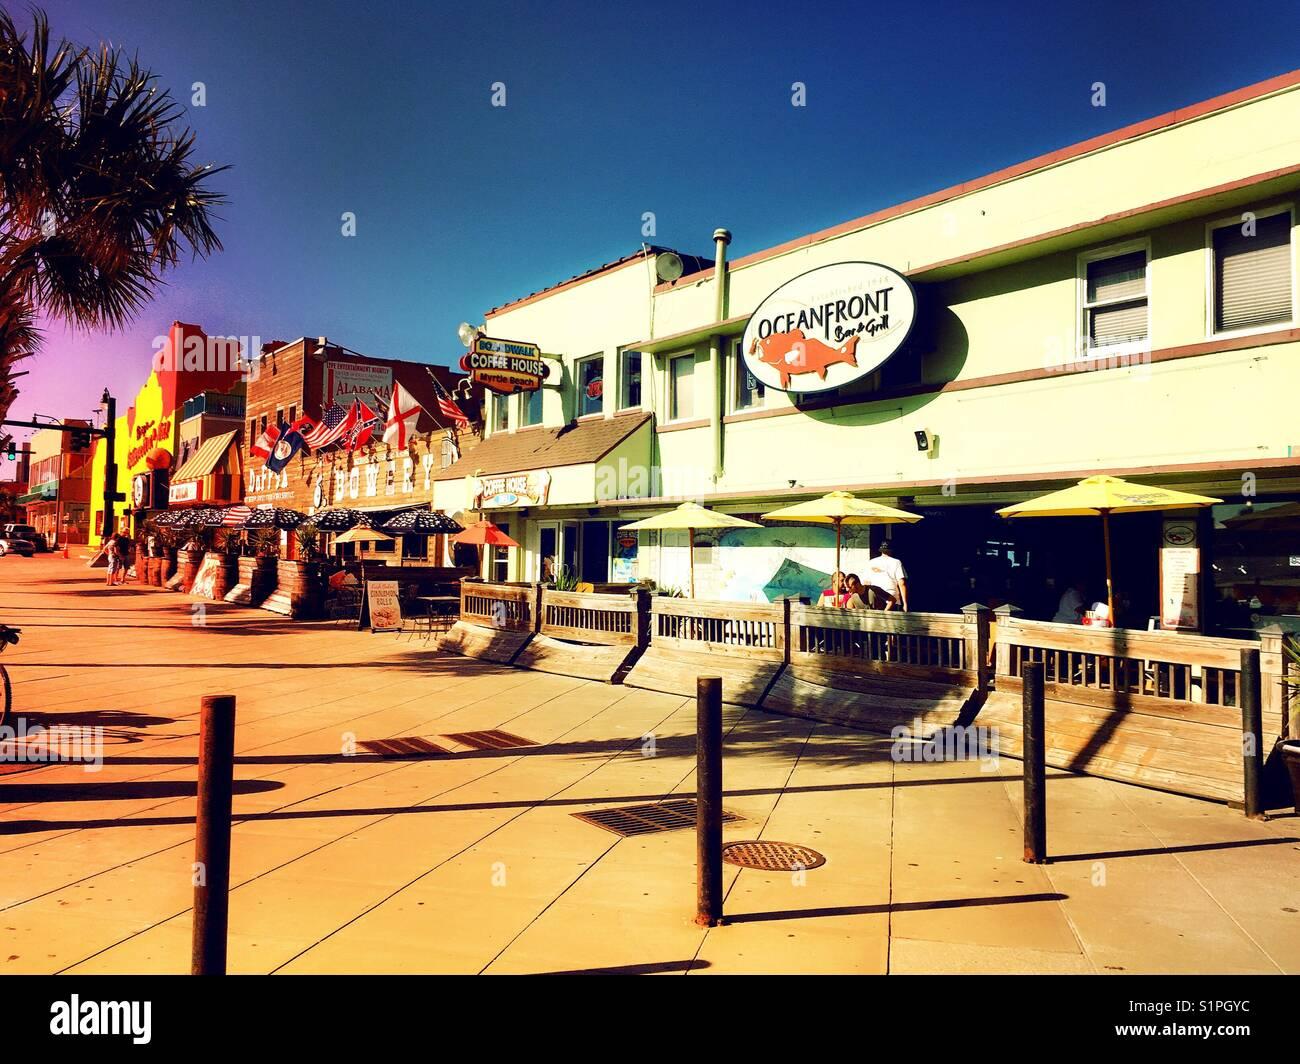 Oceanfront boardwalk, shops and bars, Myrtle Beach, South Carolina, USA Stock Photo